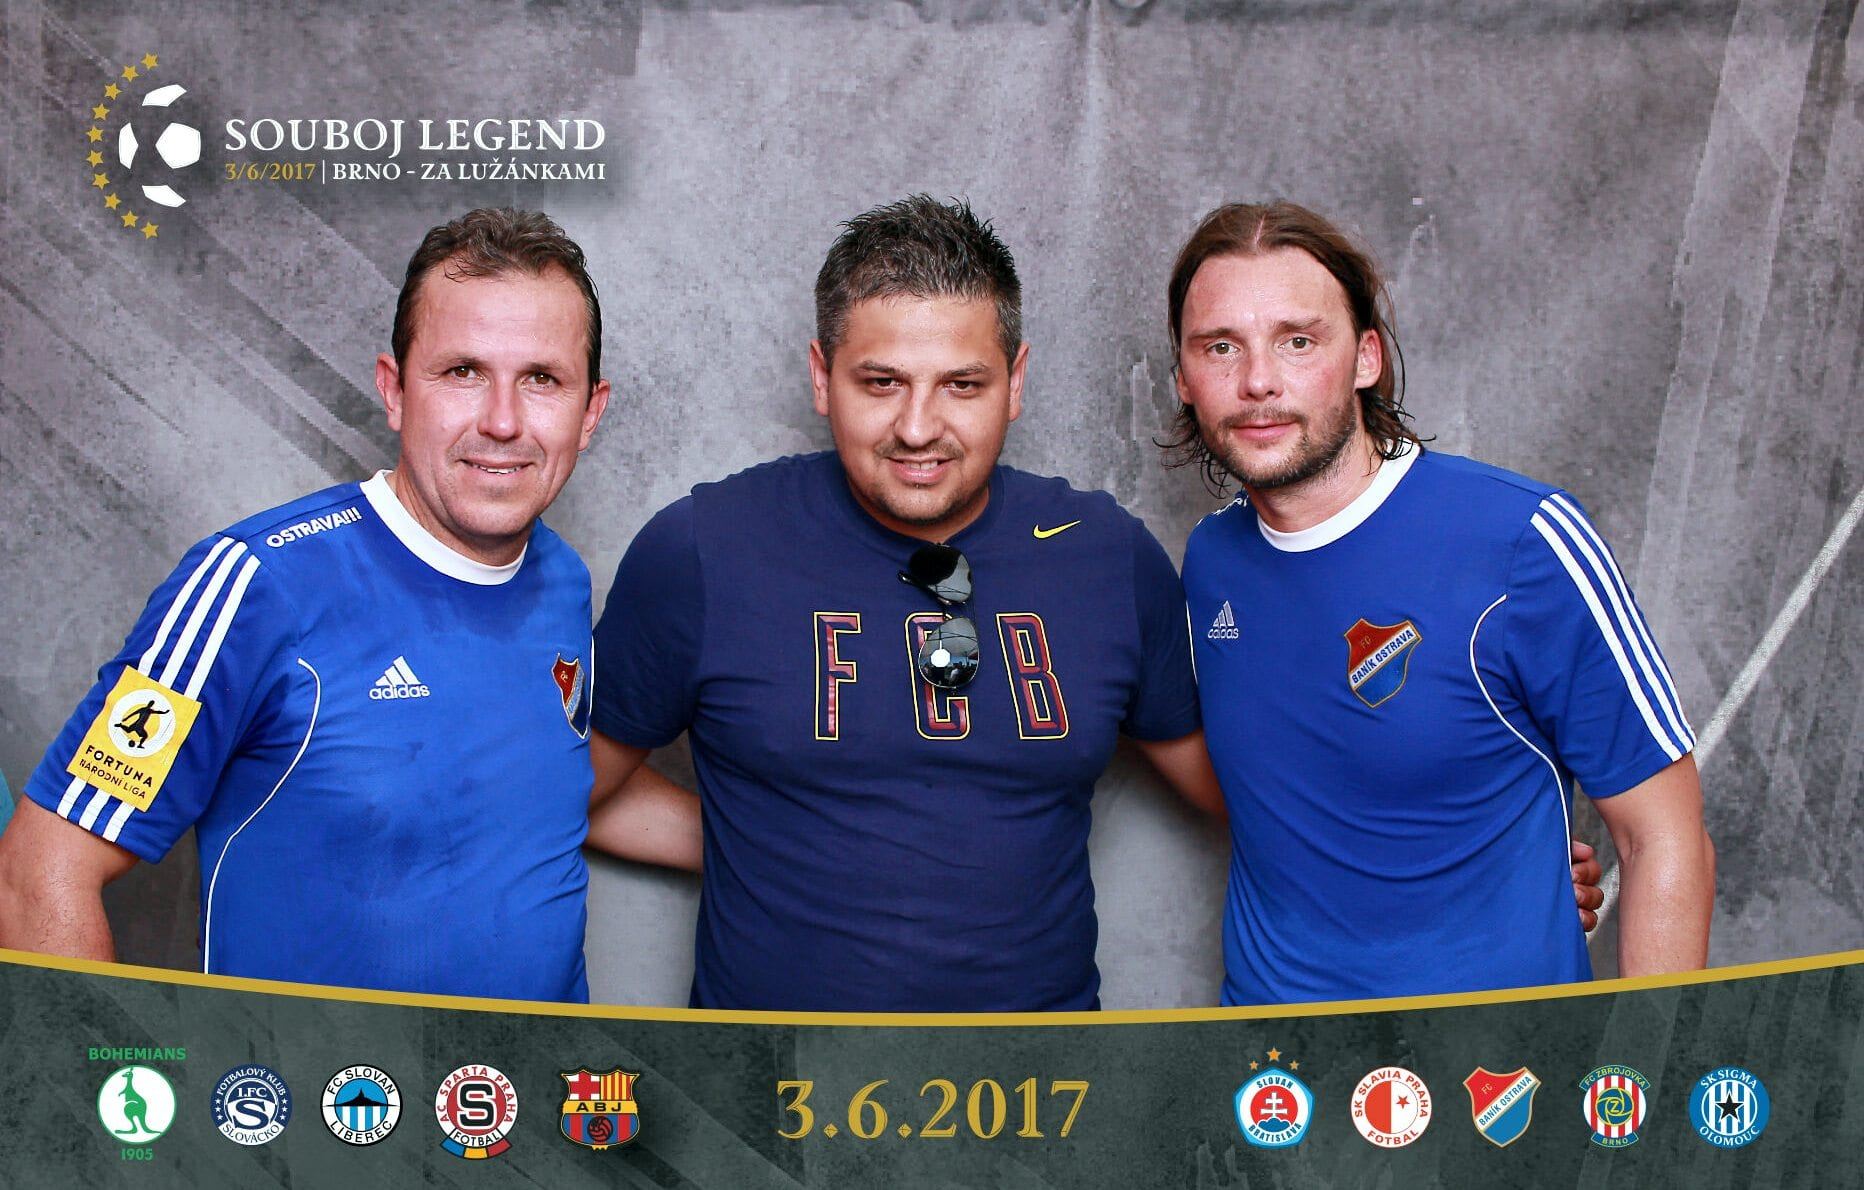 fotokoutek-souboj-legend-3-6-2017-256440